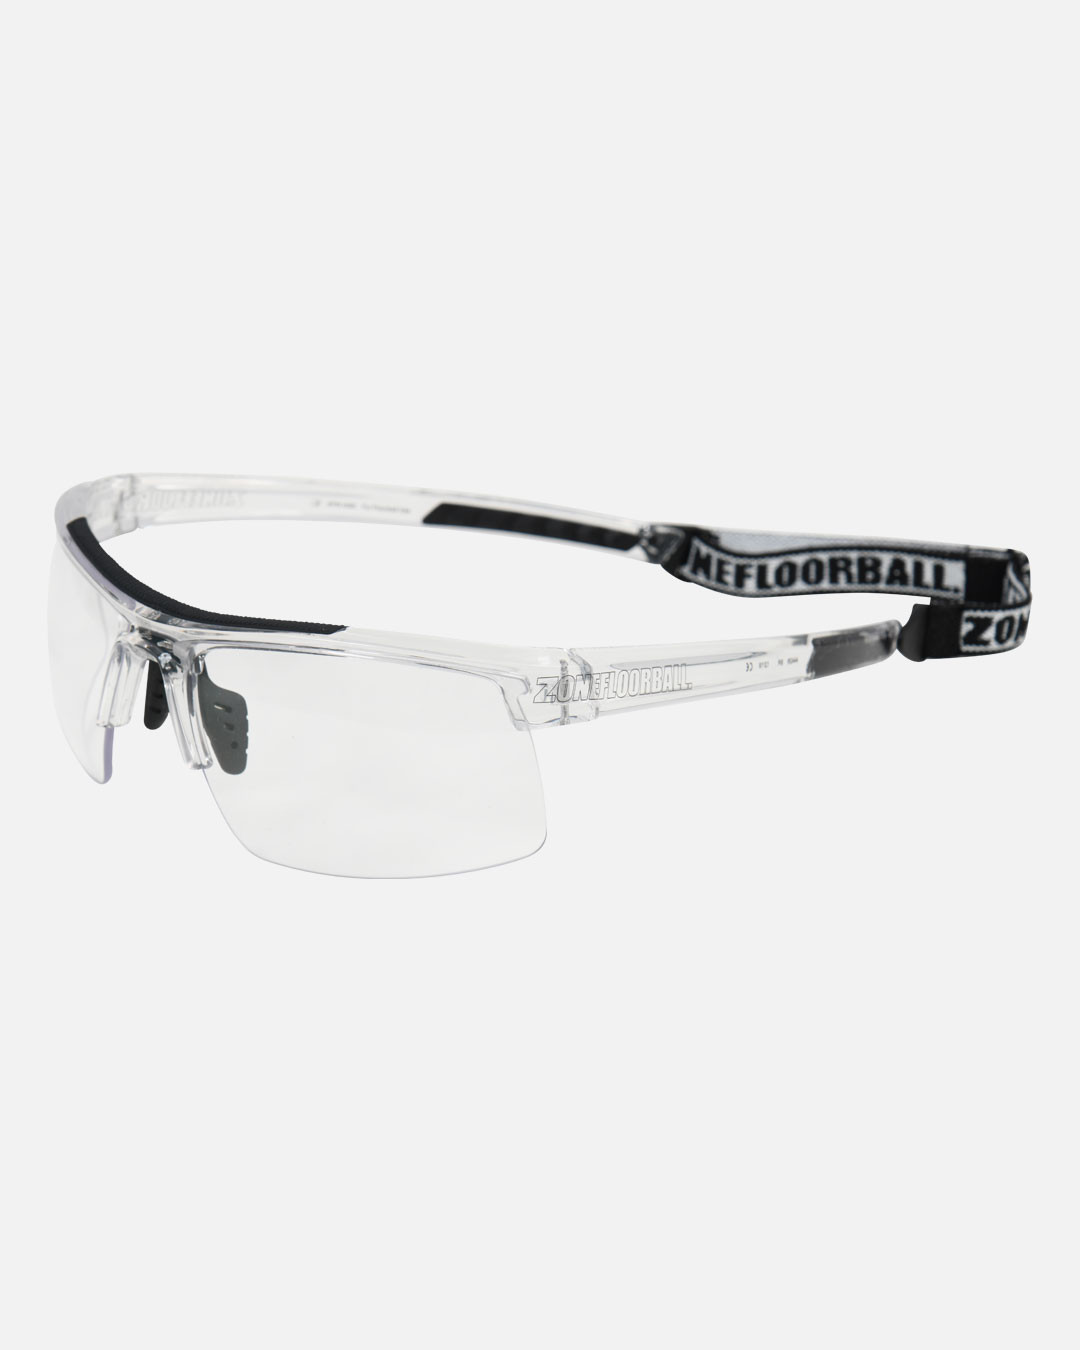 PROTECTOR SPORT GLASSES SENIOR TRANSPARENT/BLACK